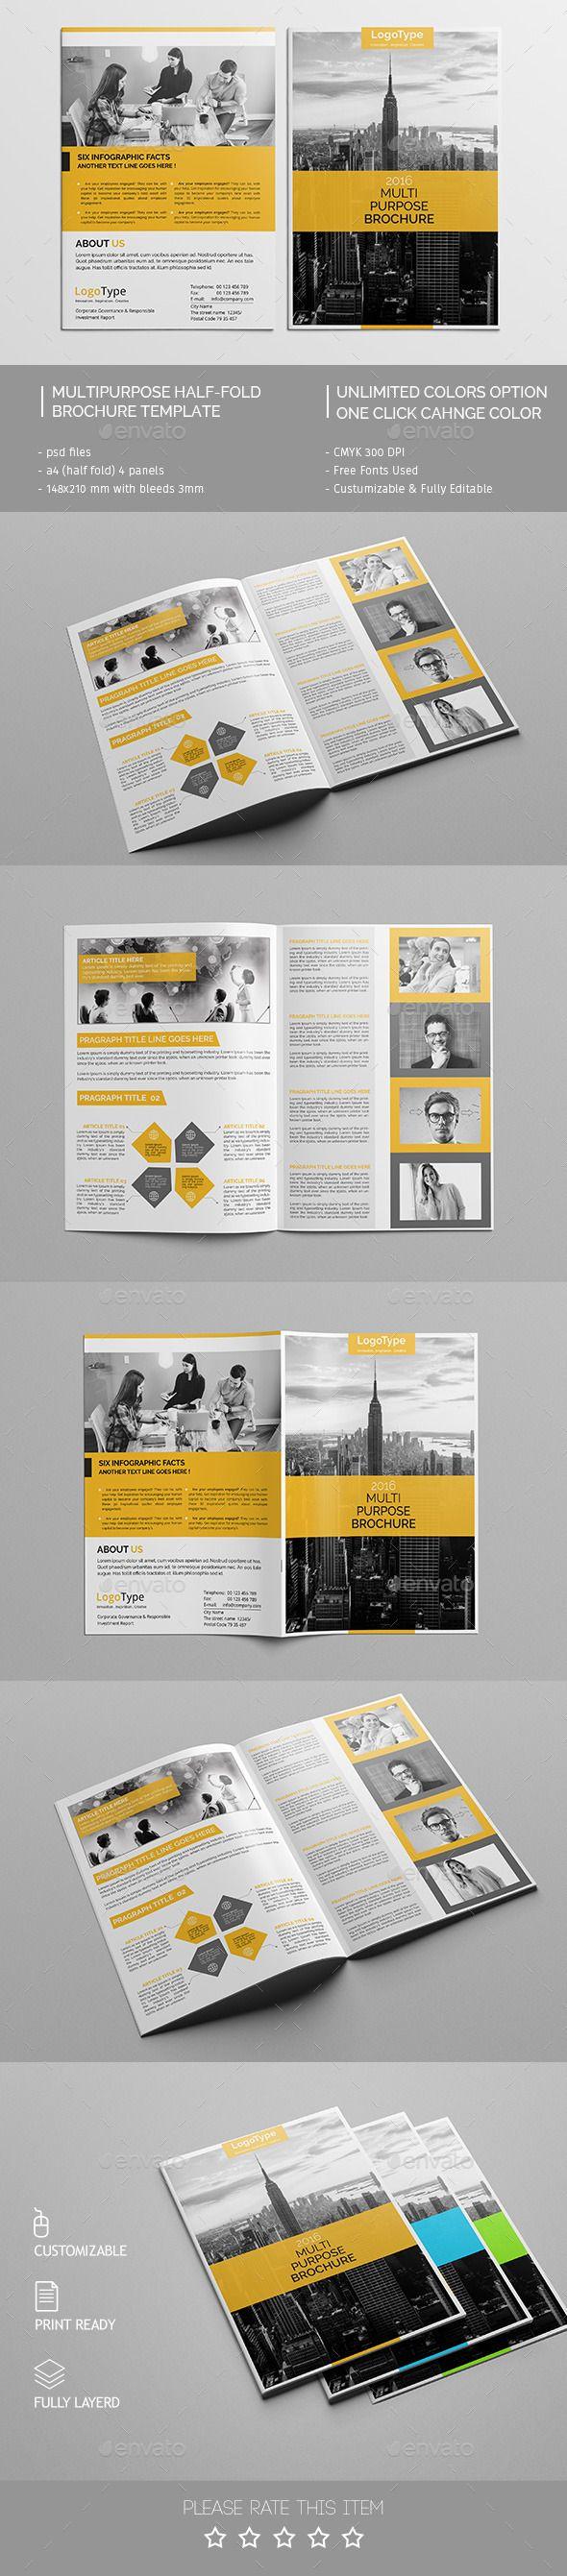 Corporate Bi-fold Brochure Template PSD #design Download: http://graphicriver.net/item/corporate-bifold-brochure-template-08/13771026?ref=ksioks